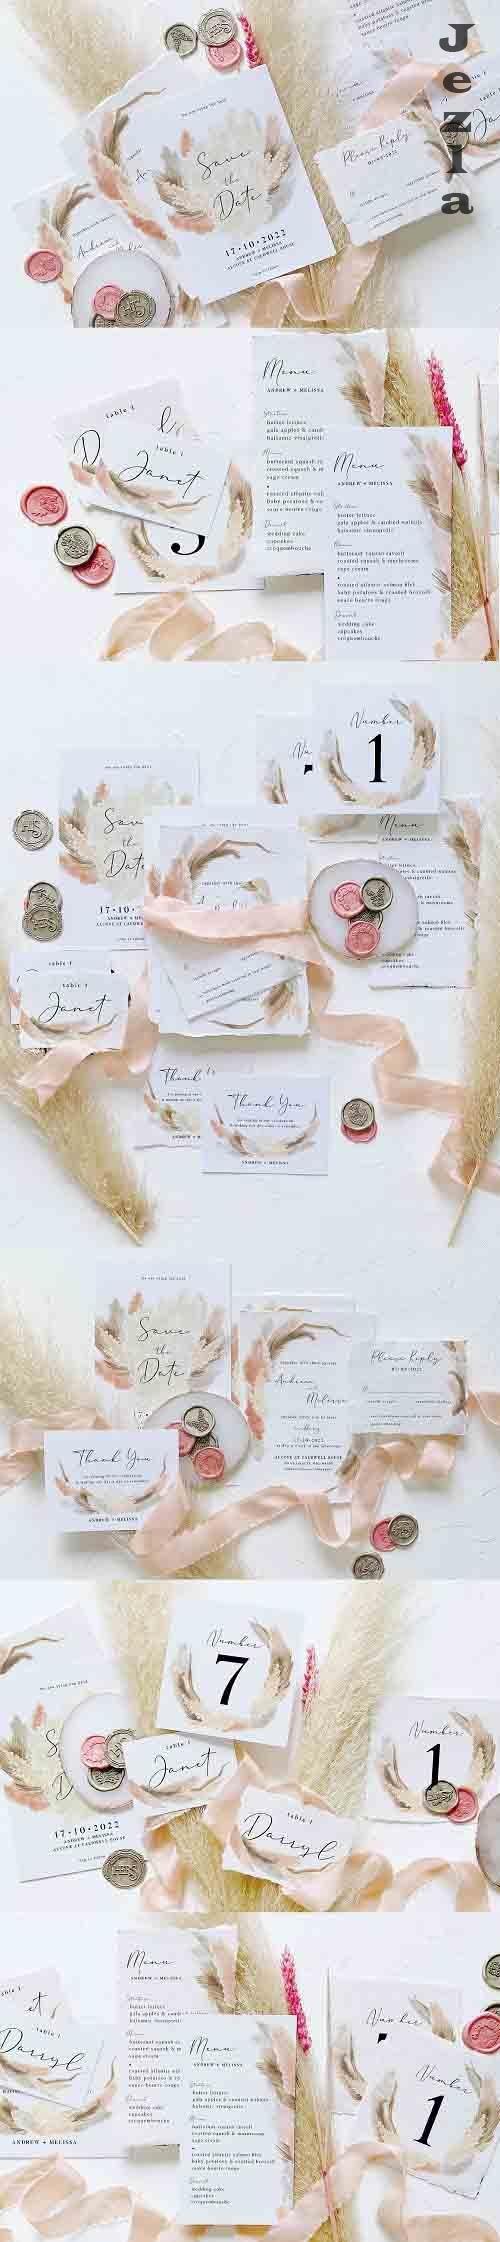 Pampas Grass Wedding Suite - 6166397